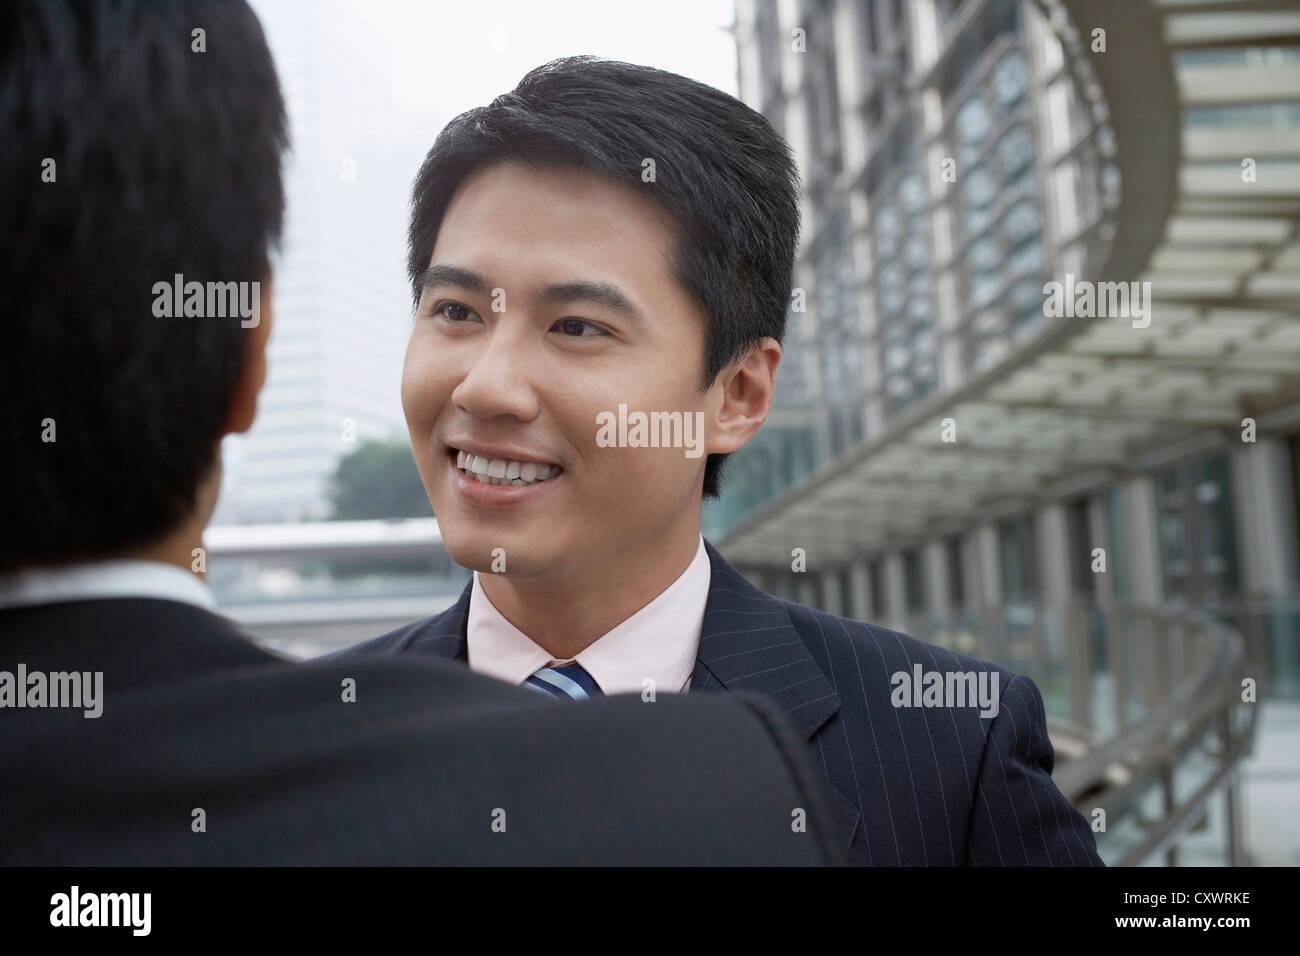 Businessmen talking on walkway - Stock Image